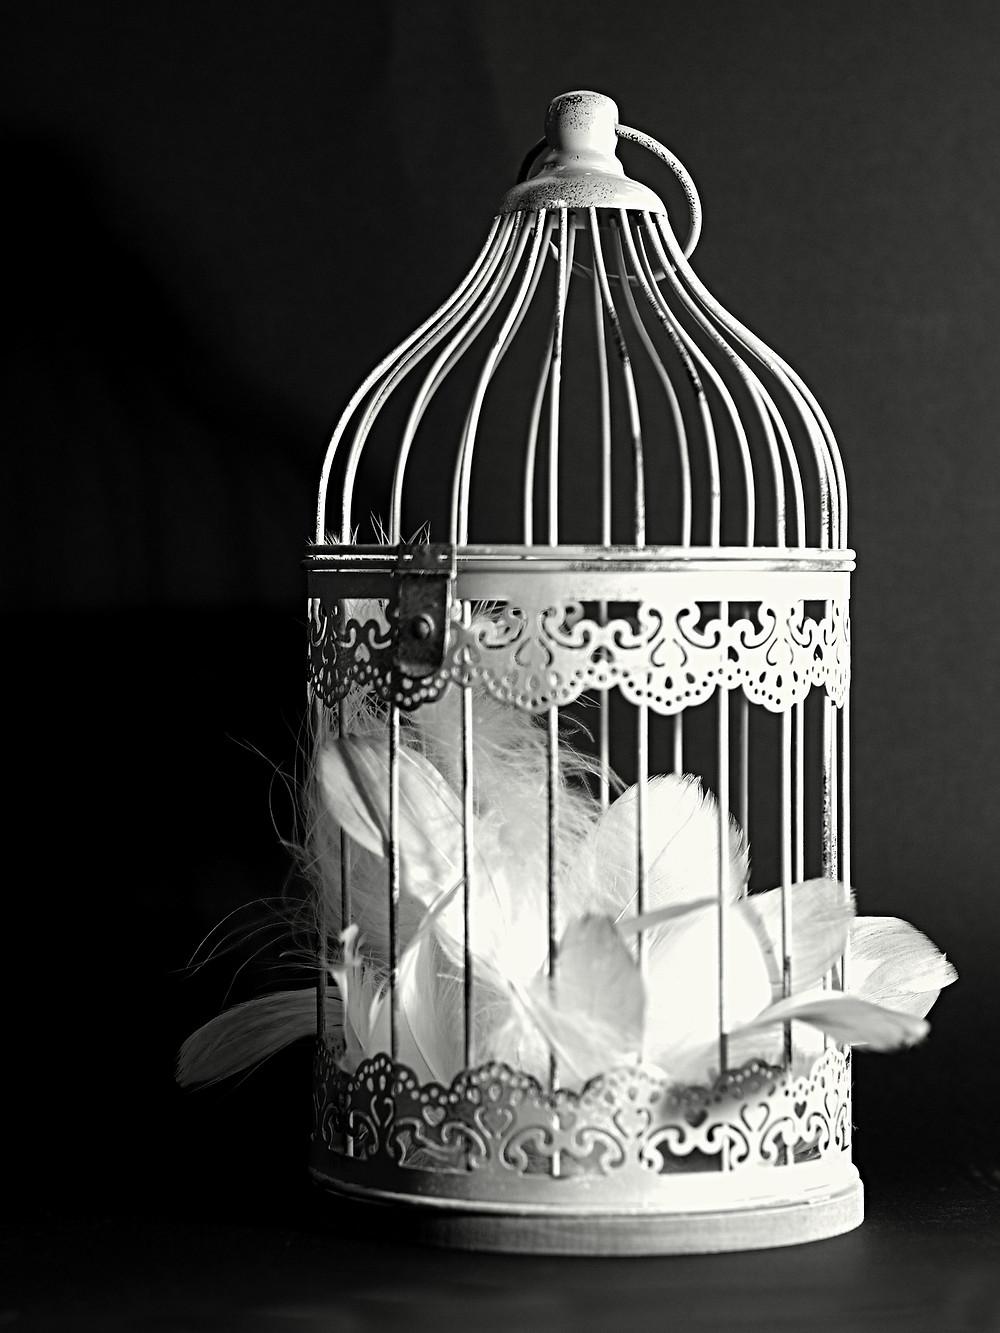 Cage of Feathers - Manolaya